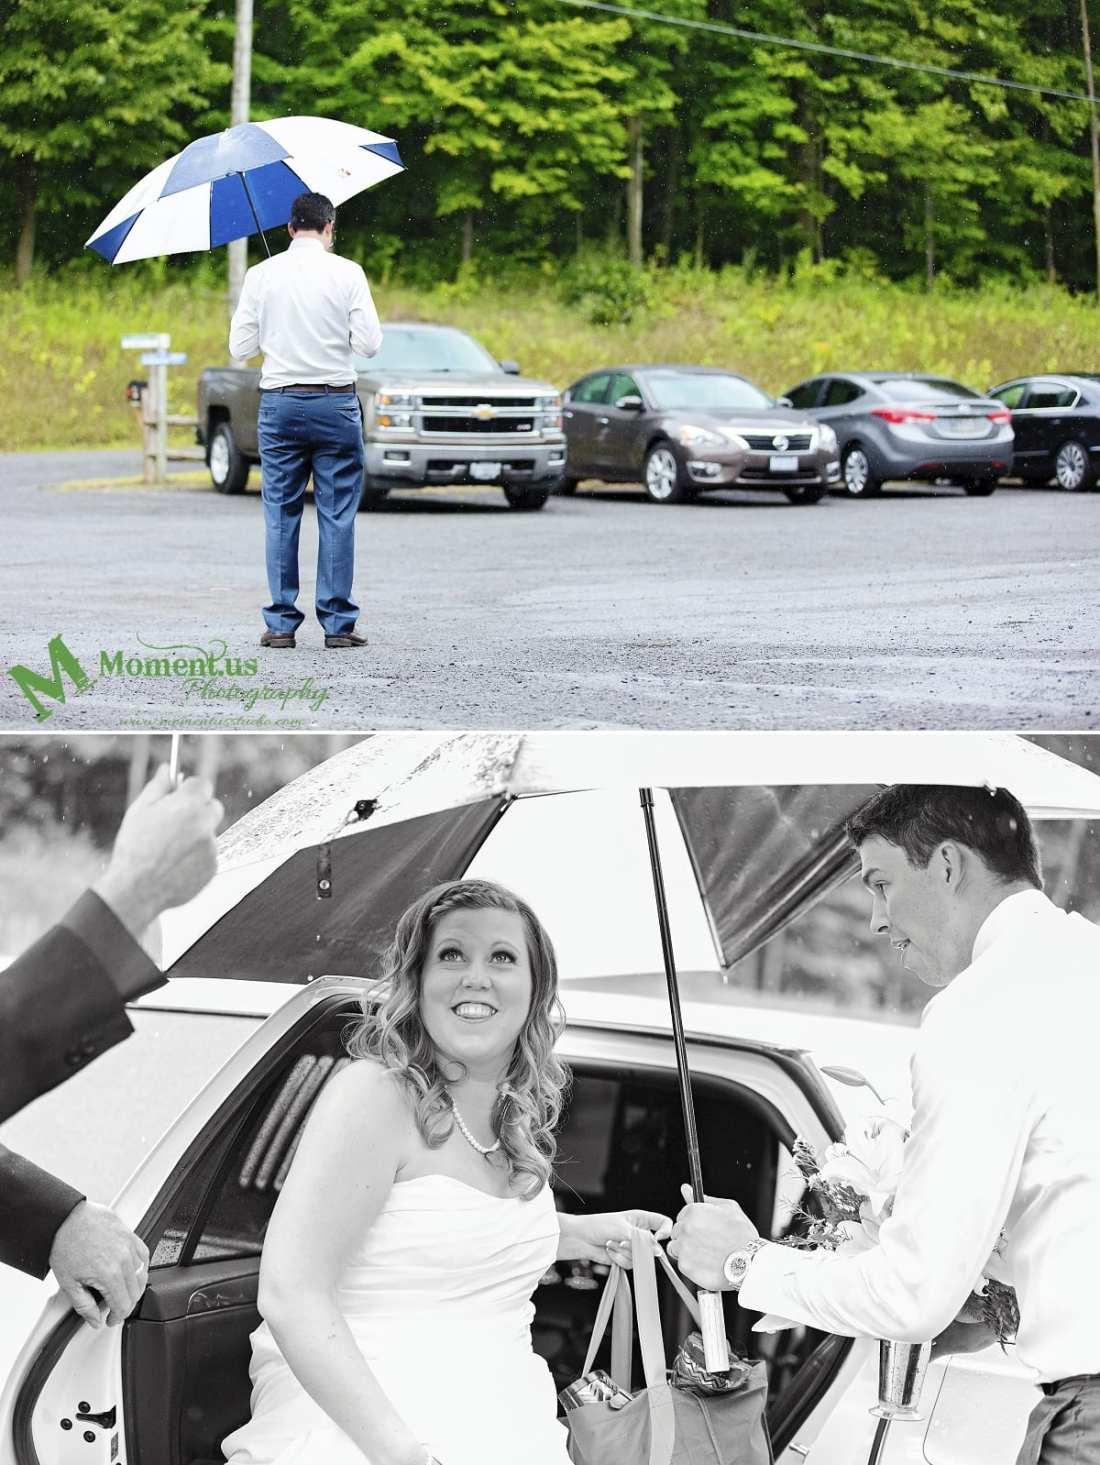 rustic country wedding photos - usher in rain with umbrella